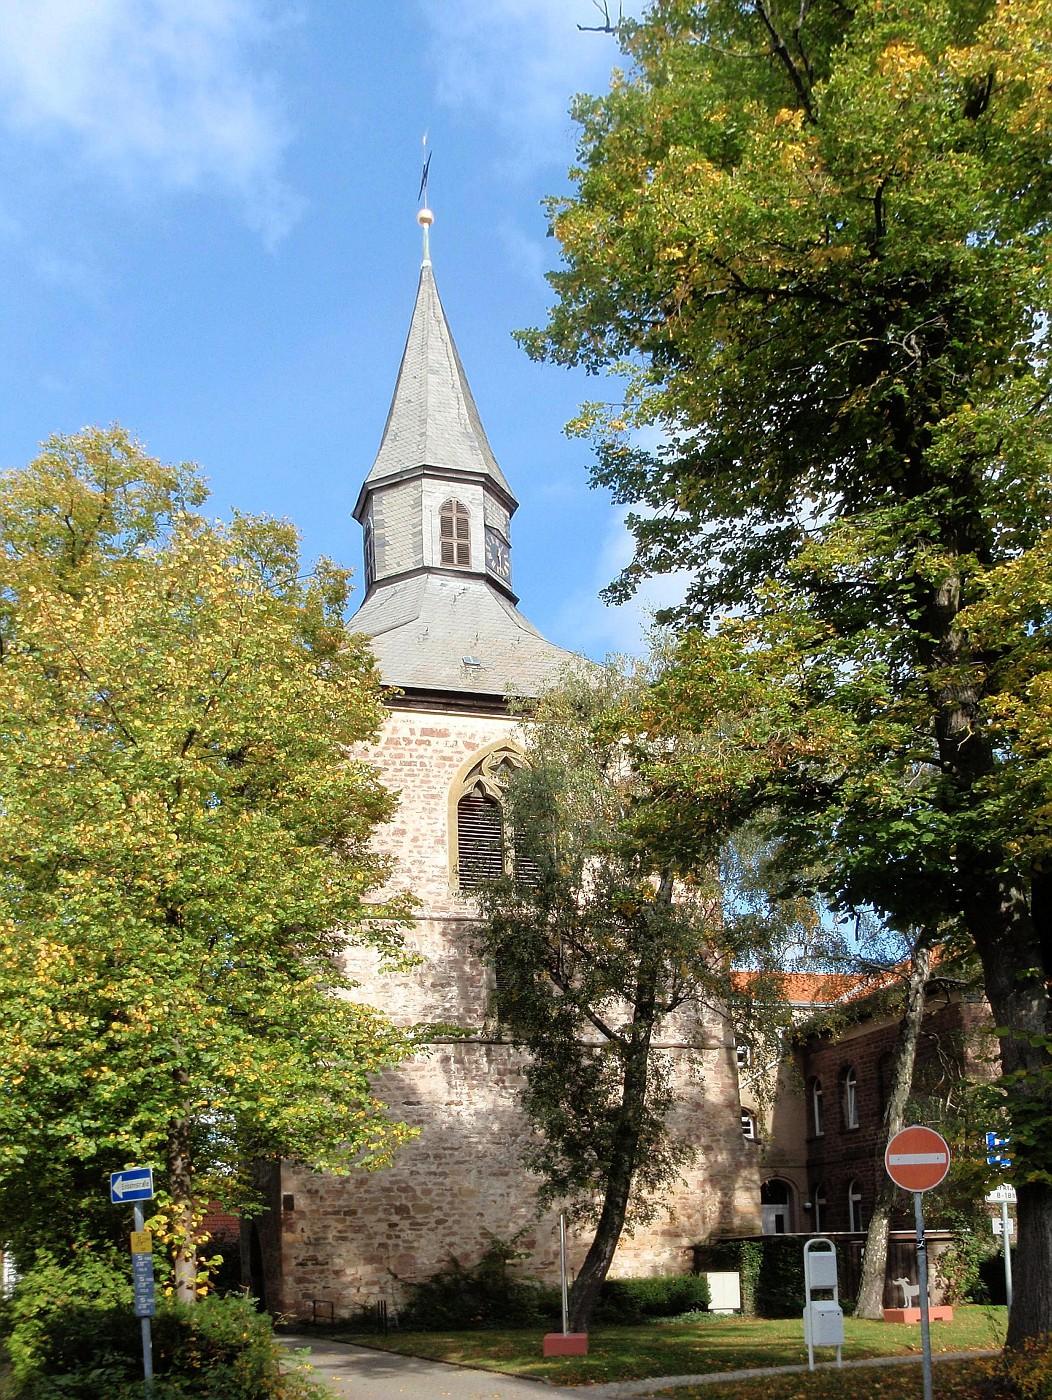 Martiniturm Blomberg